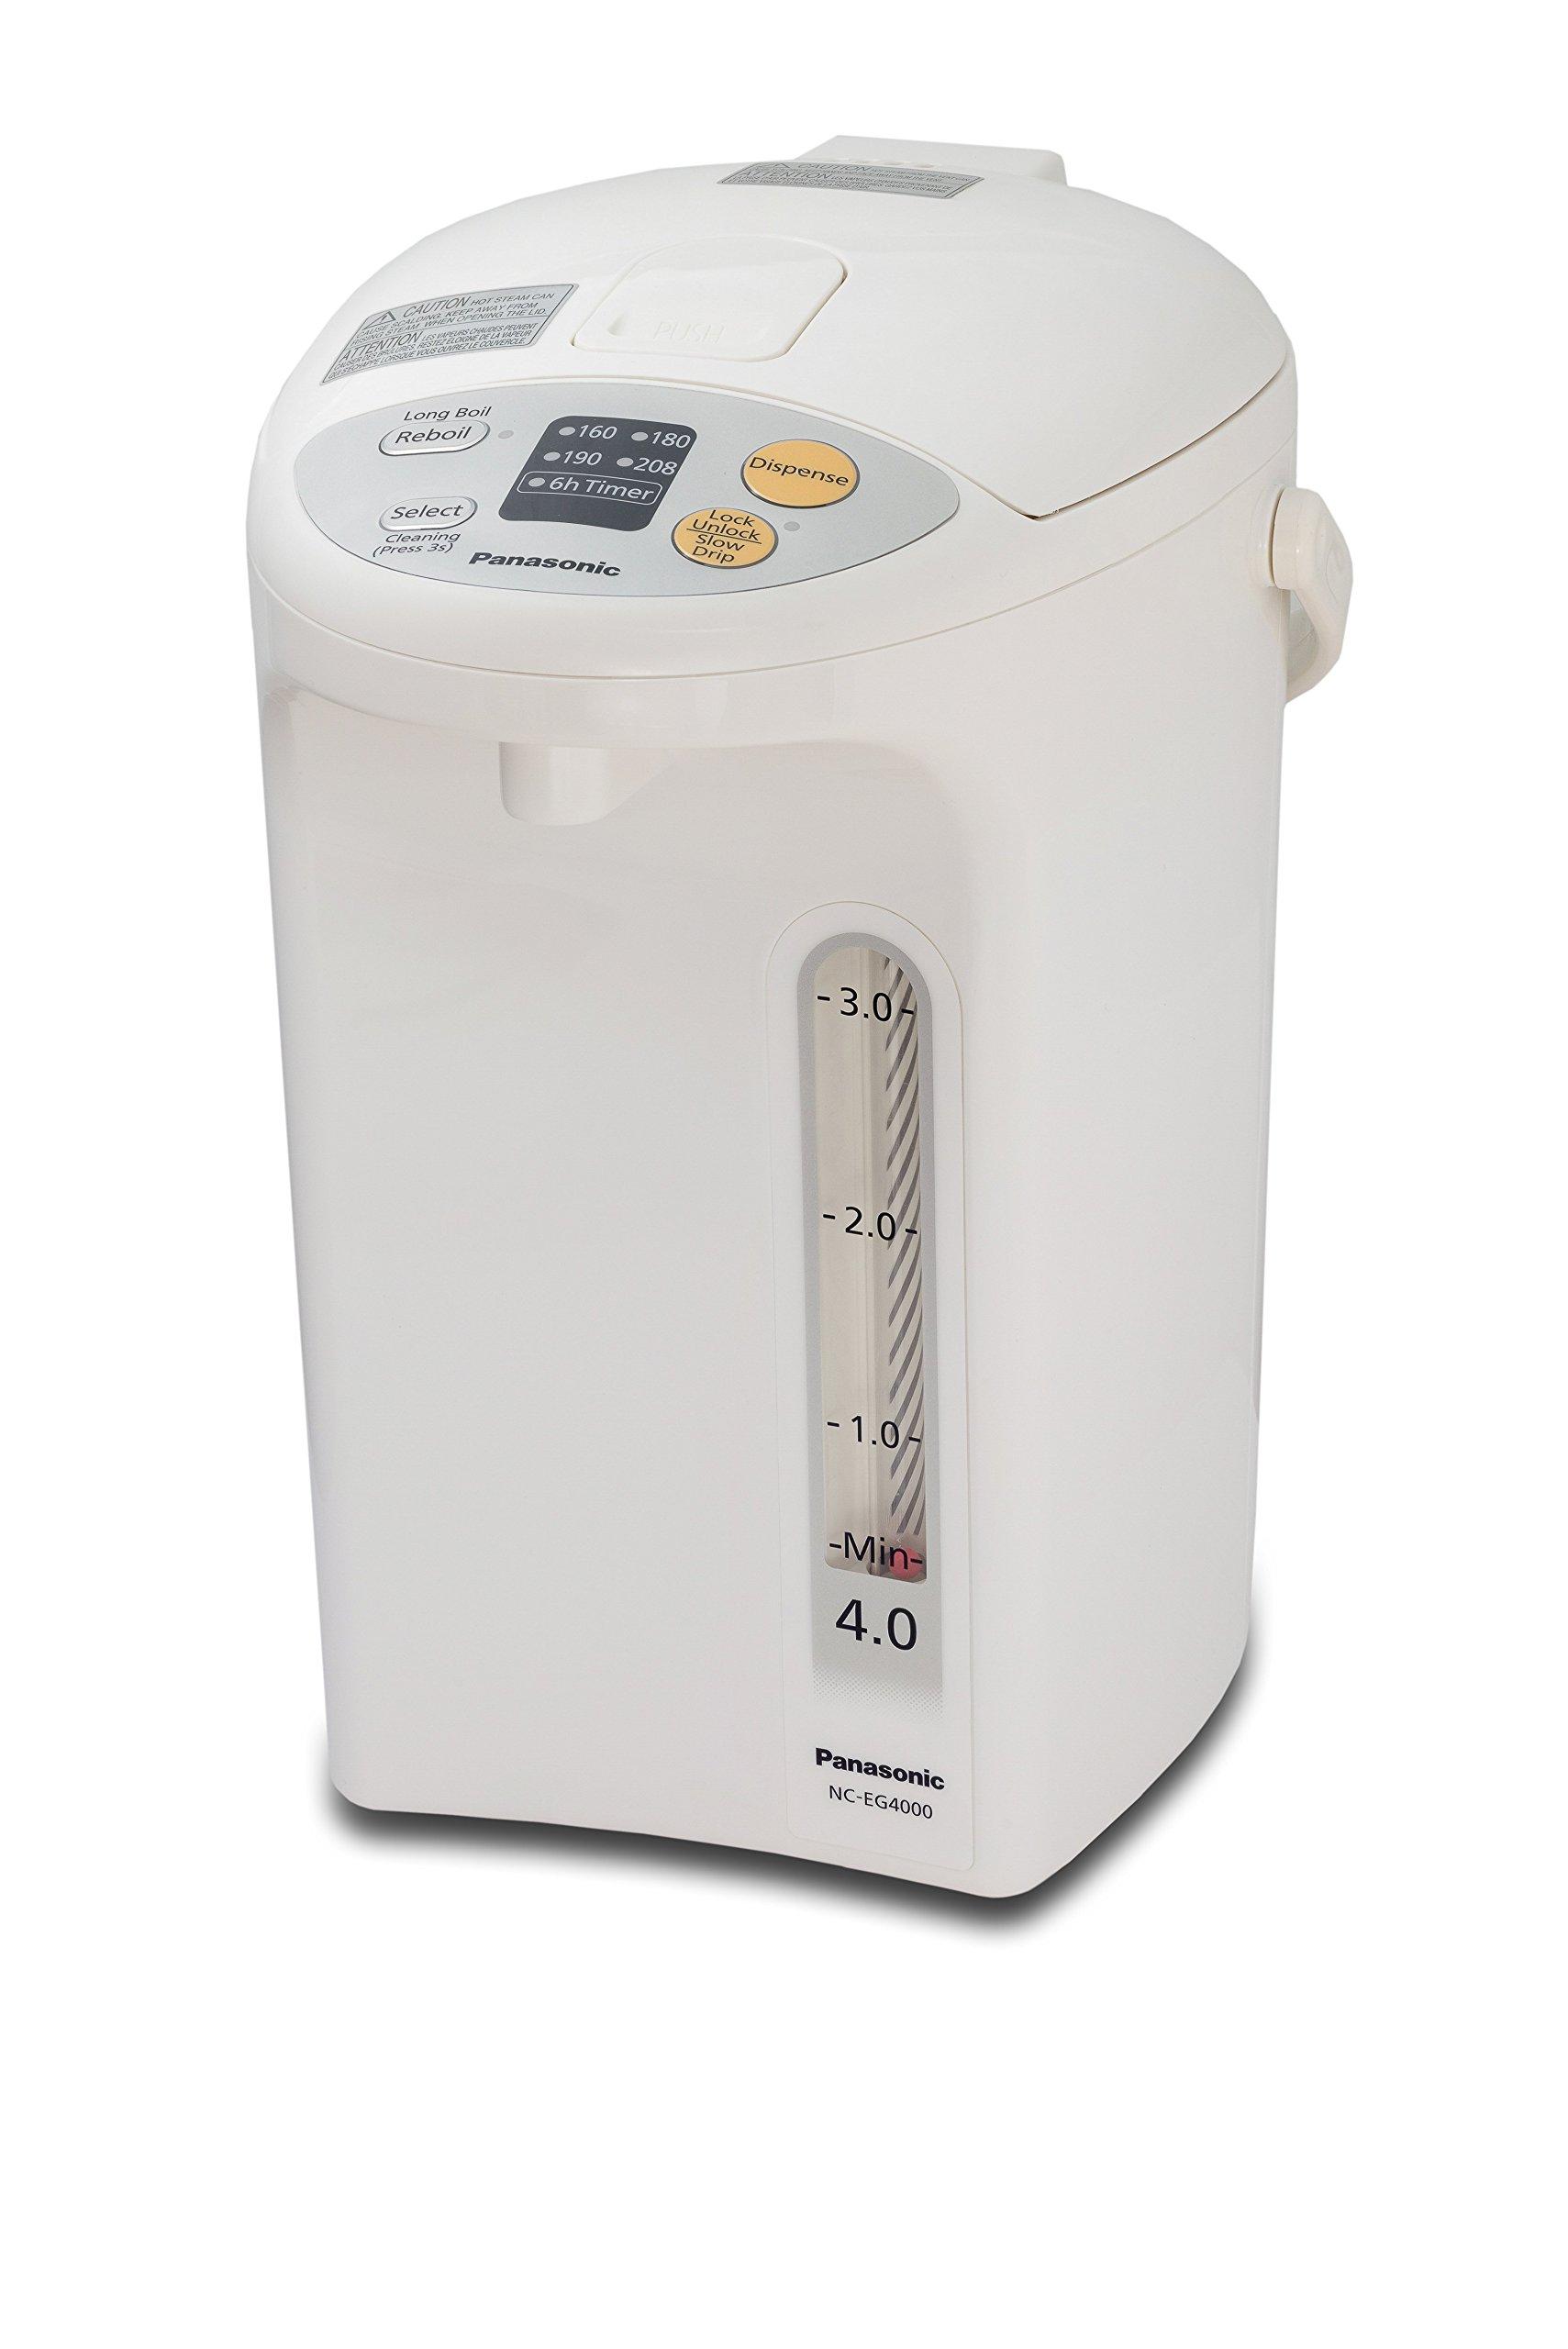 Panasonic NC-EG4000 Thermo Pot, 4 L, White